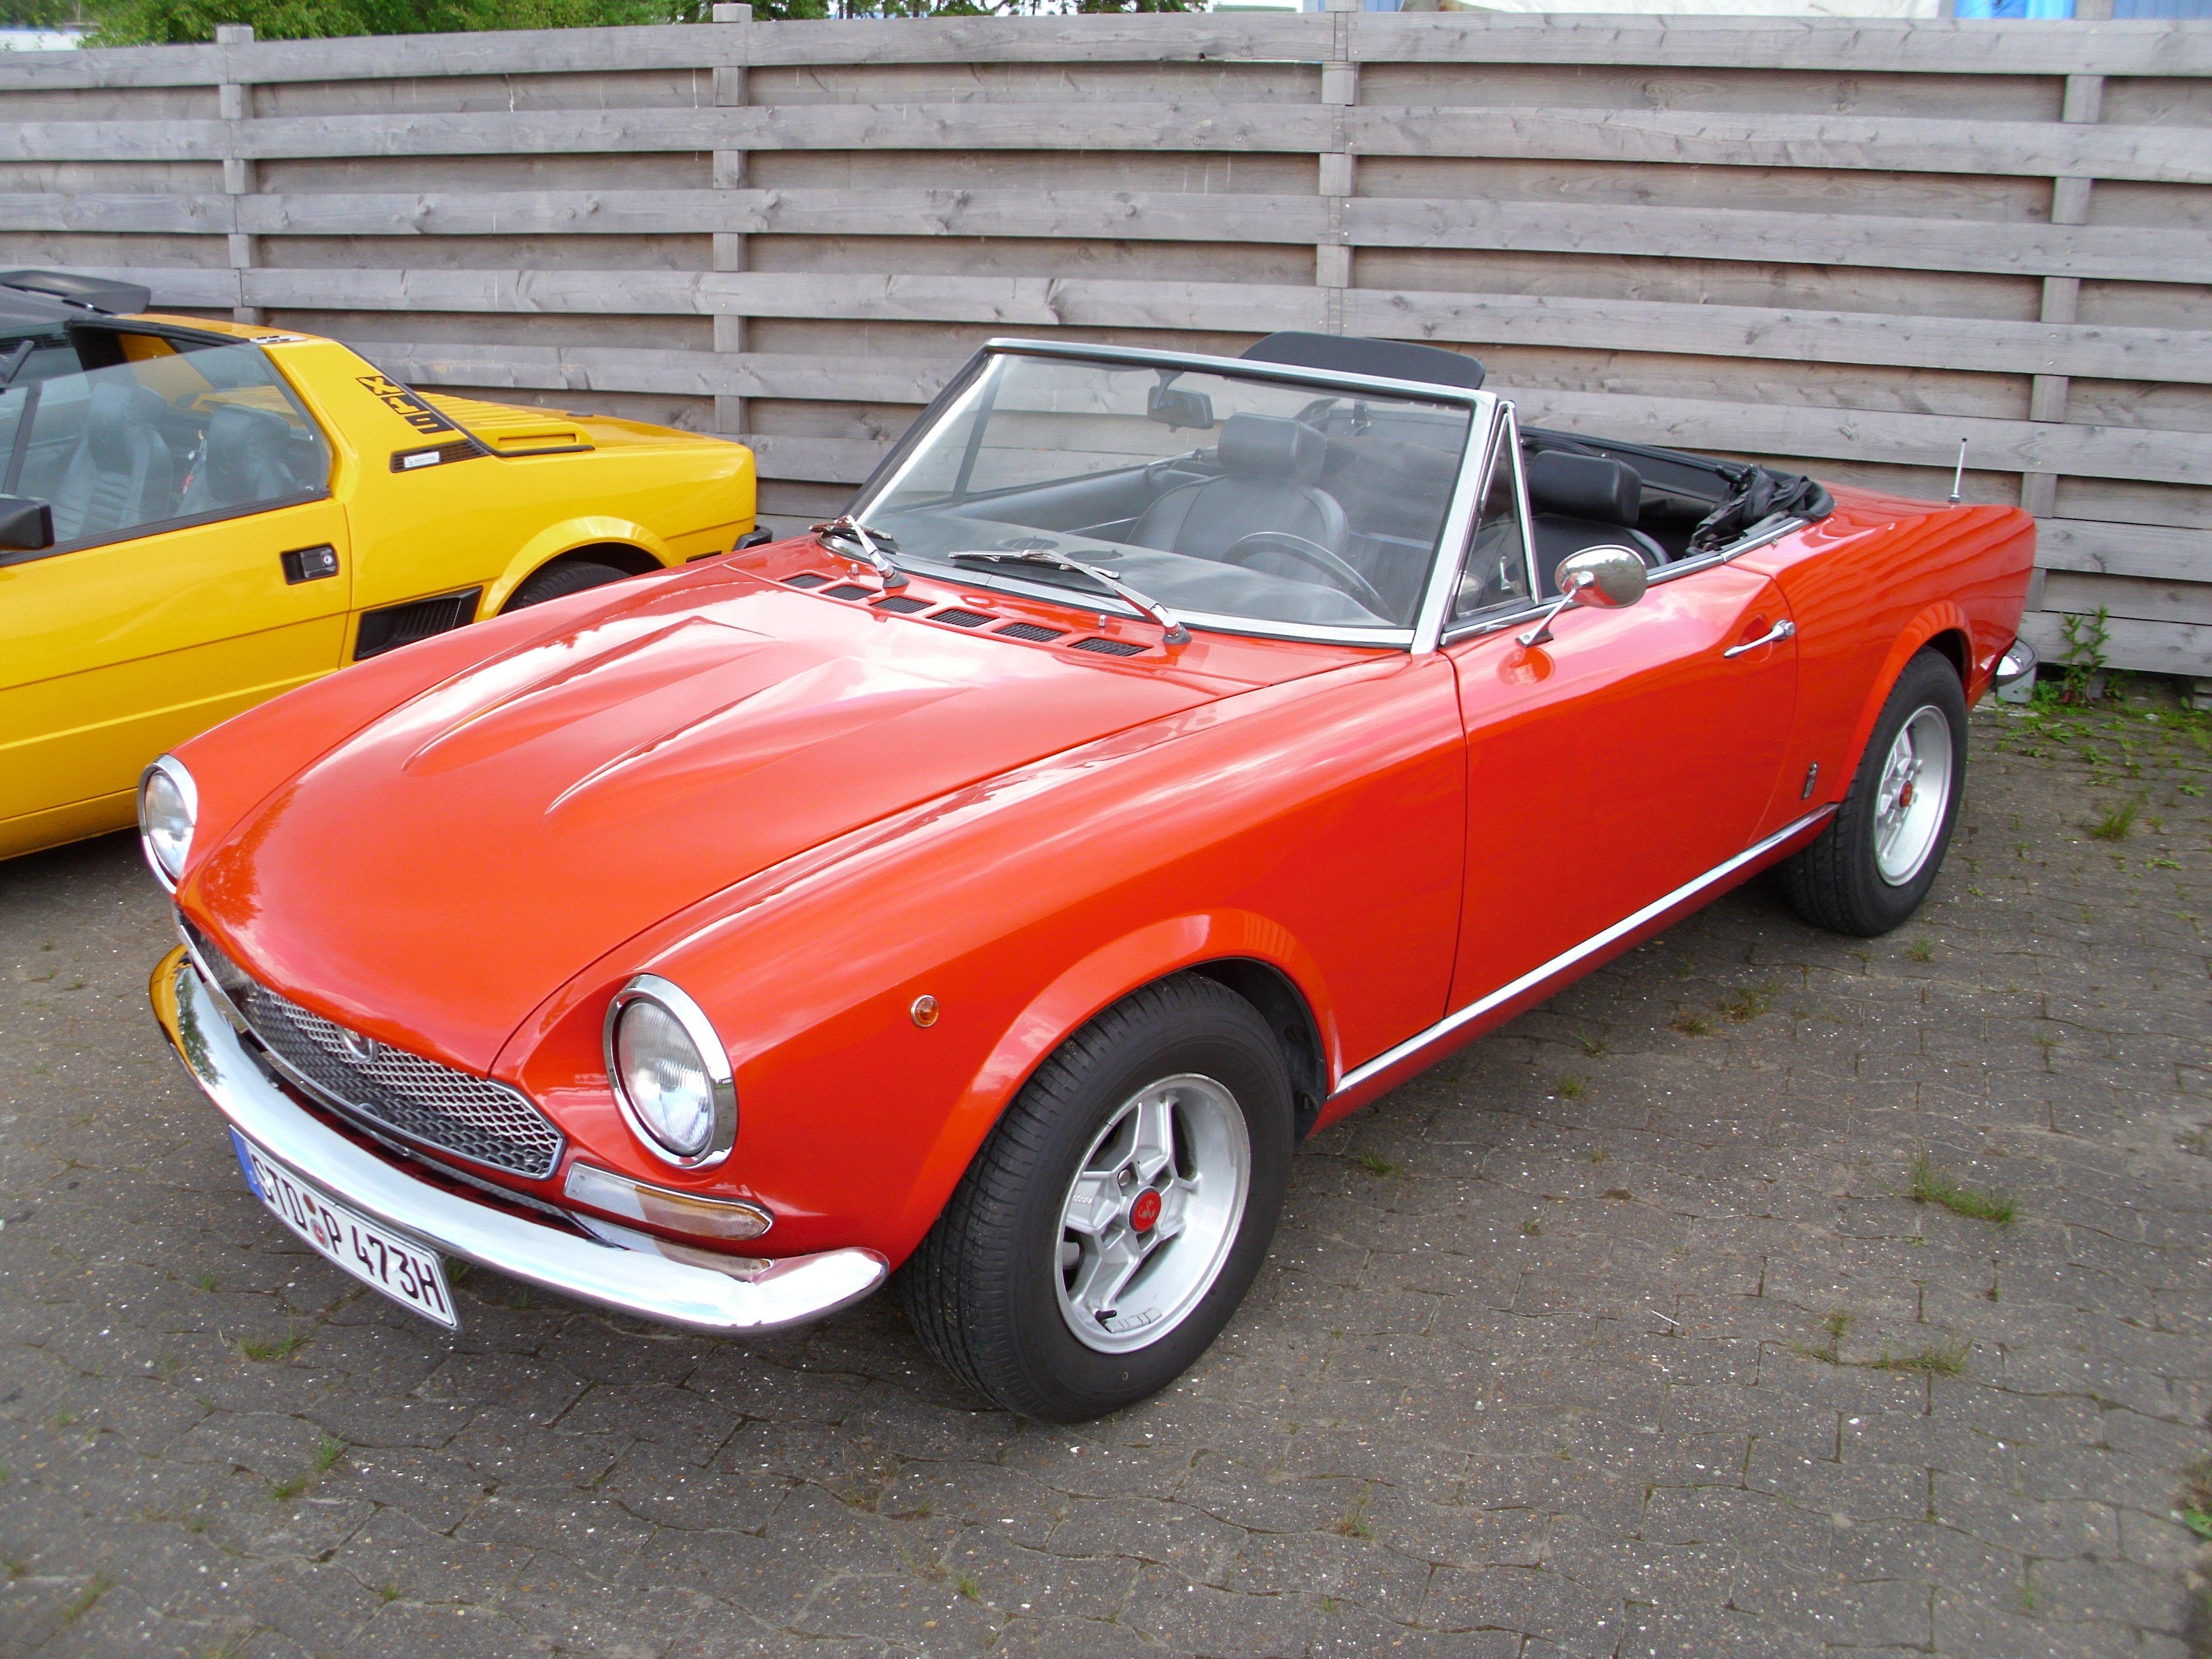 fiat 124 sport spider 1600 classic cars convertible italia wallpaper 4000x3000 605139. Black Bedroom Furniture Sets. Home Design Ideas